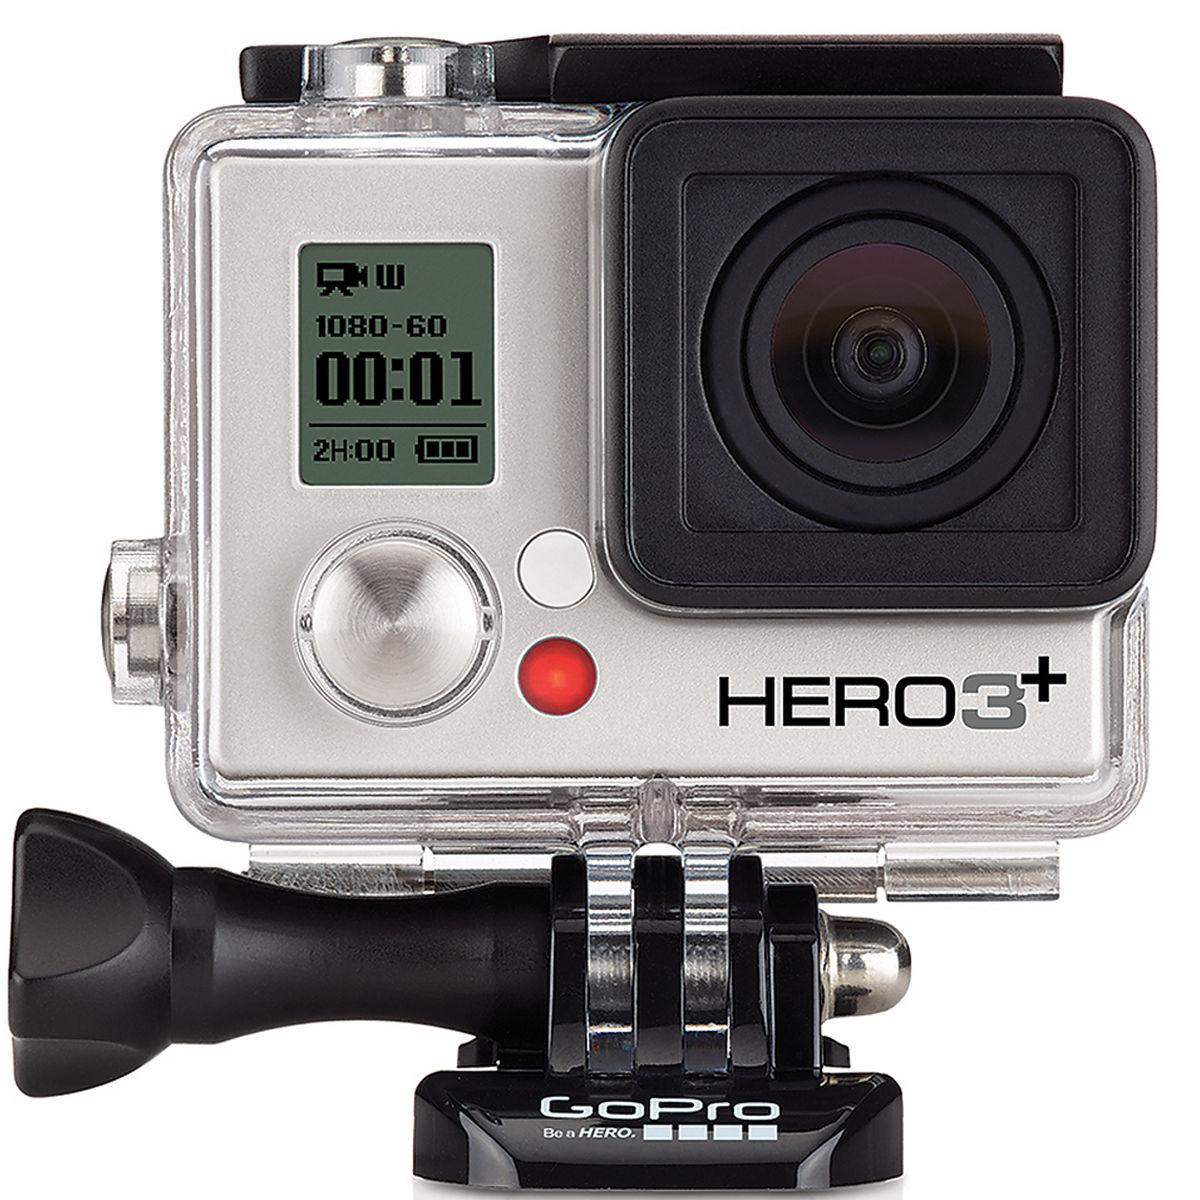 GoPro HERO3+ Silver Edition Camera refurbished $149 FS ebay